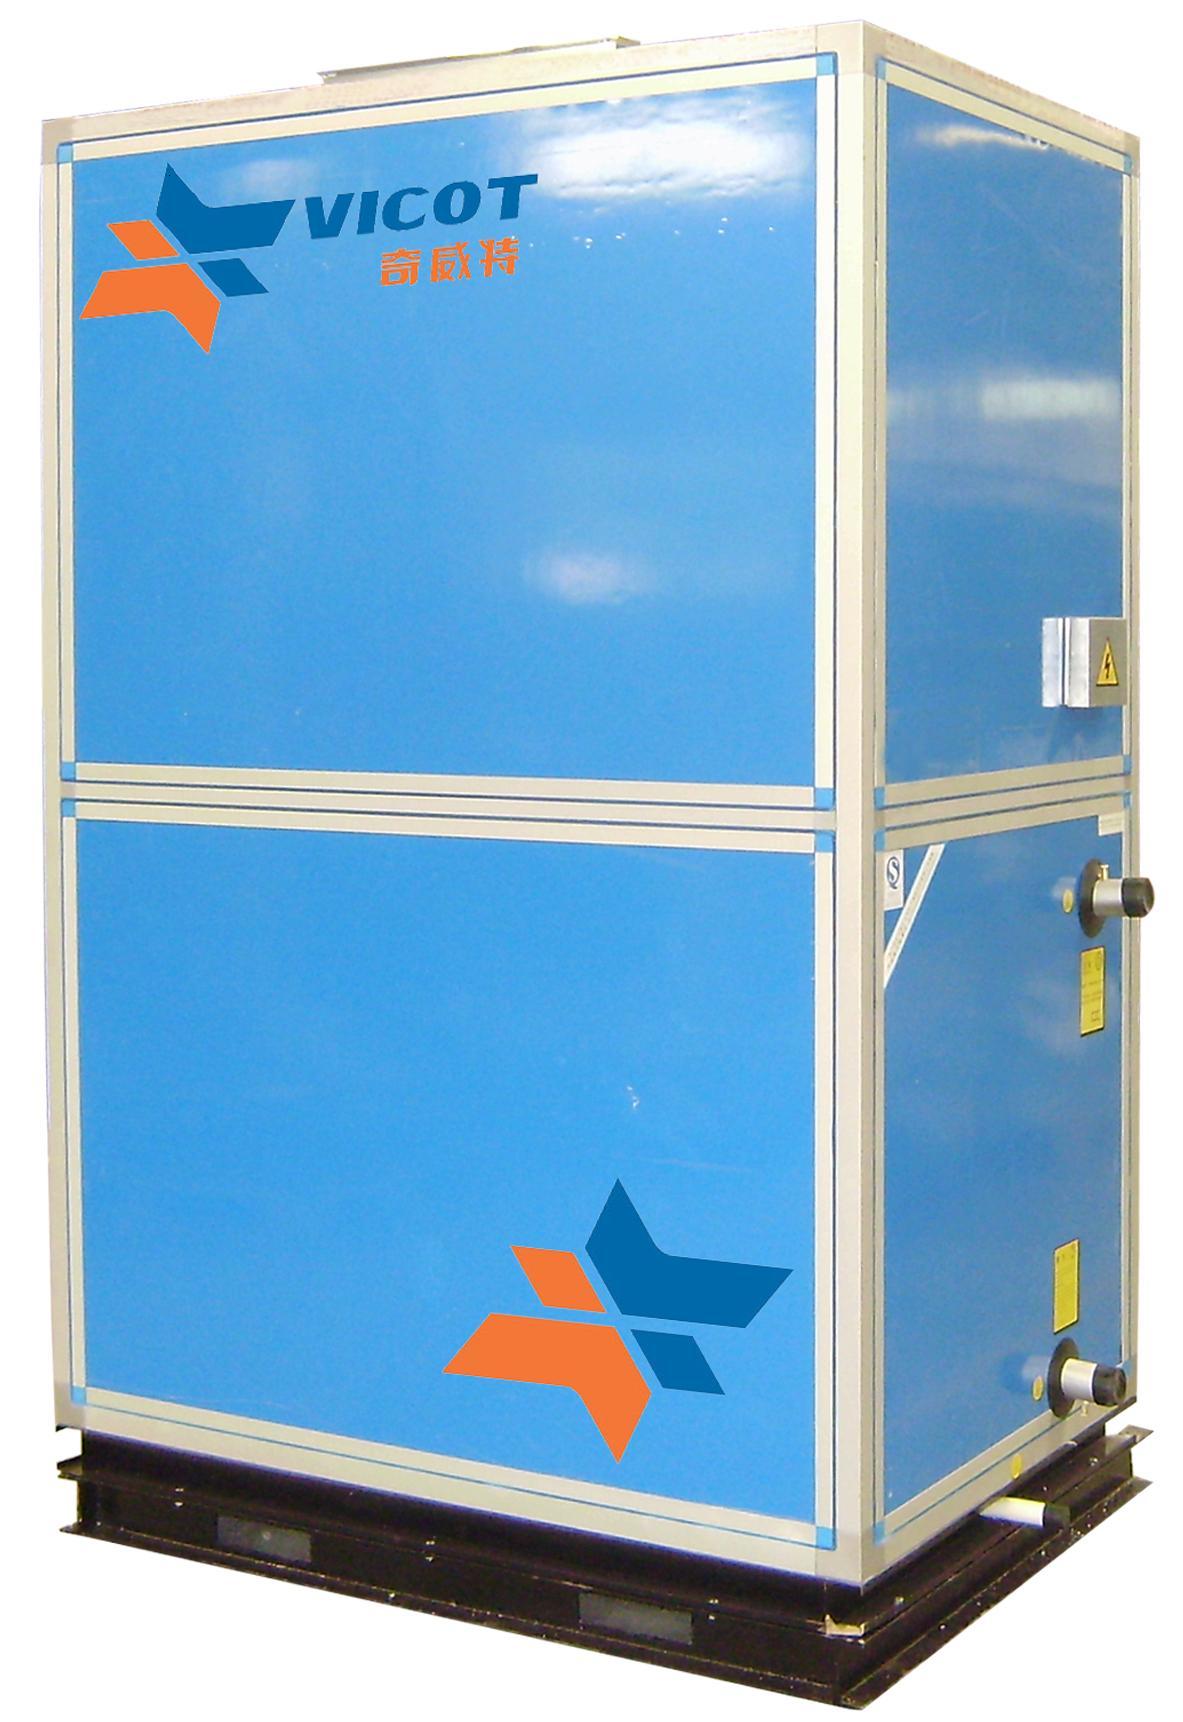 http://s9.cdn.deahu.com/show/lfile/A44D549E97B5310BD7829A242F847D1B.jpg_air handling unit(ahu)